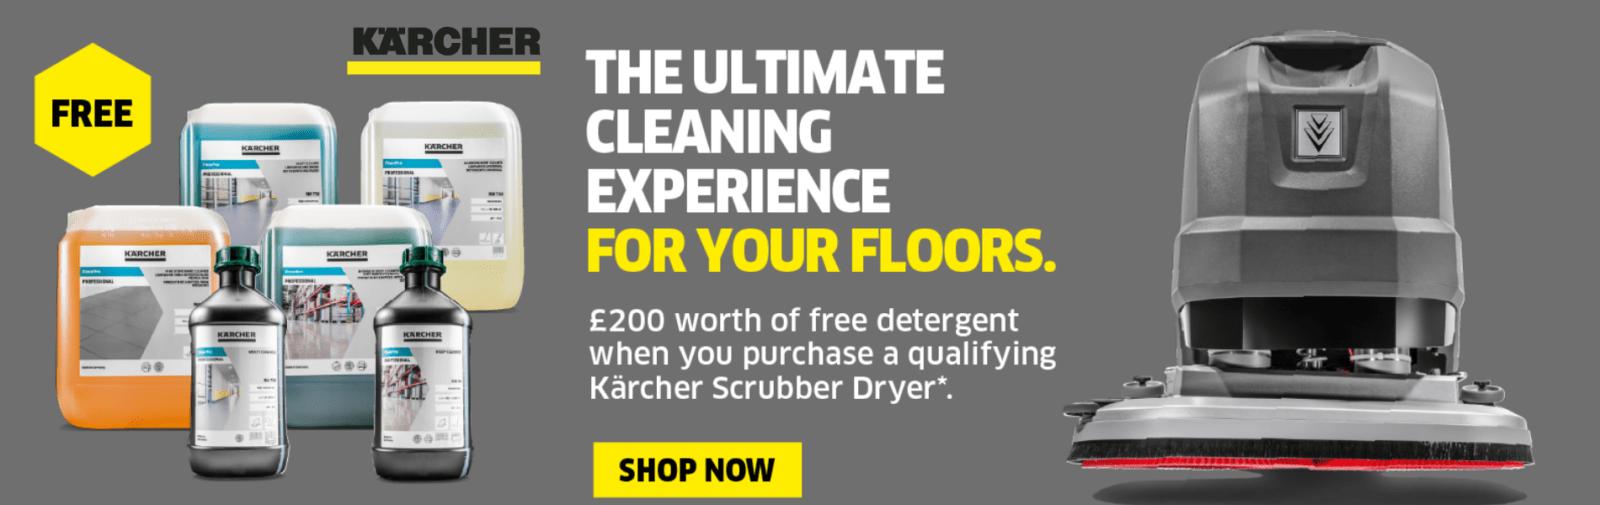 Karcher Scrubber Dryers Campaign